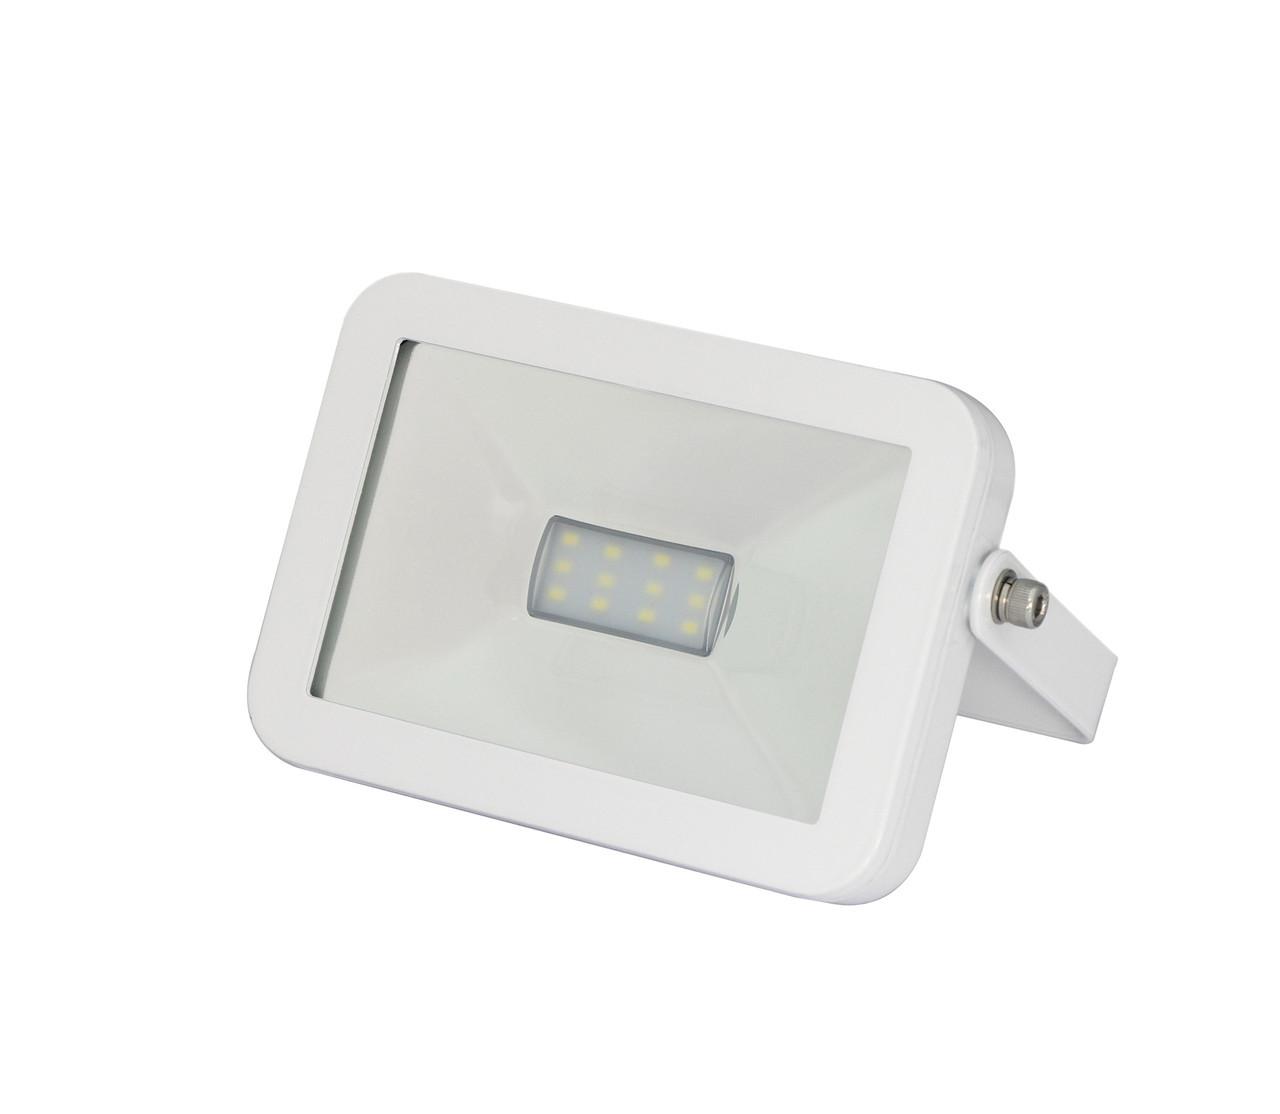 LED Прожектор EUROELECTRIC COB белый 10W 6500K premium